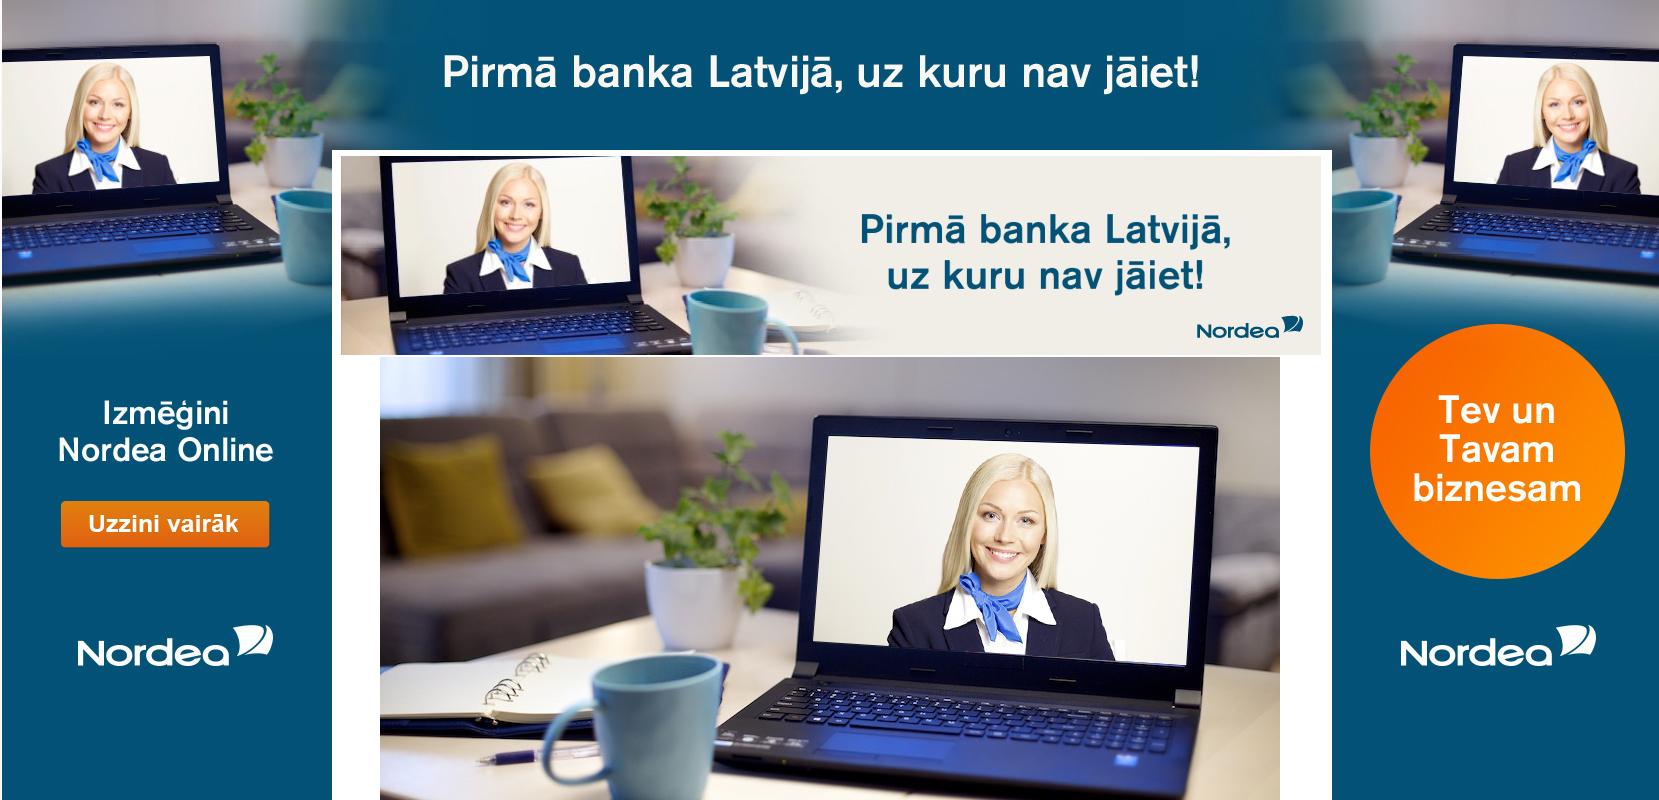 NORDEA / DDB LATVIA